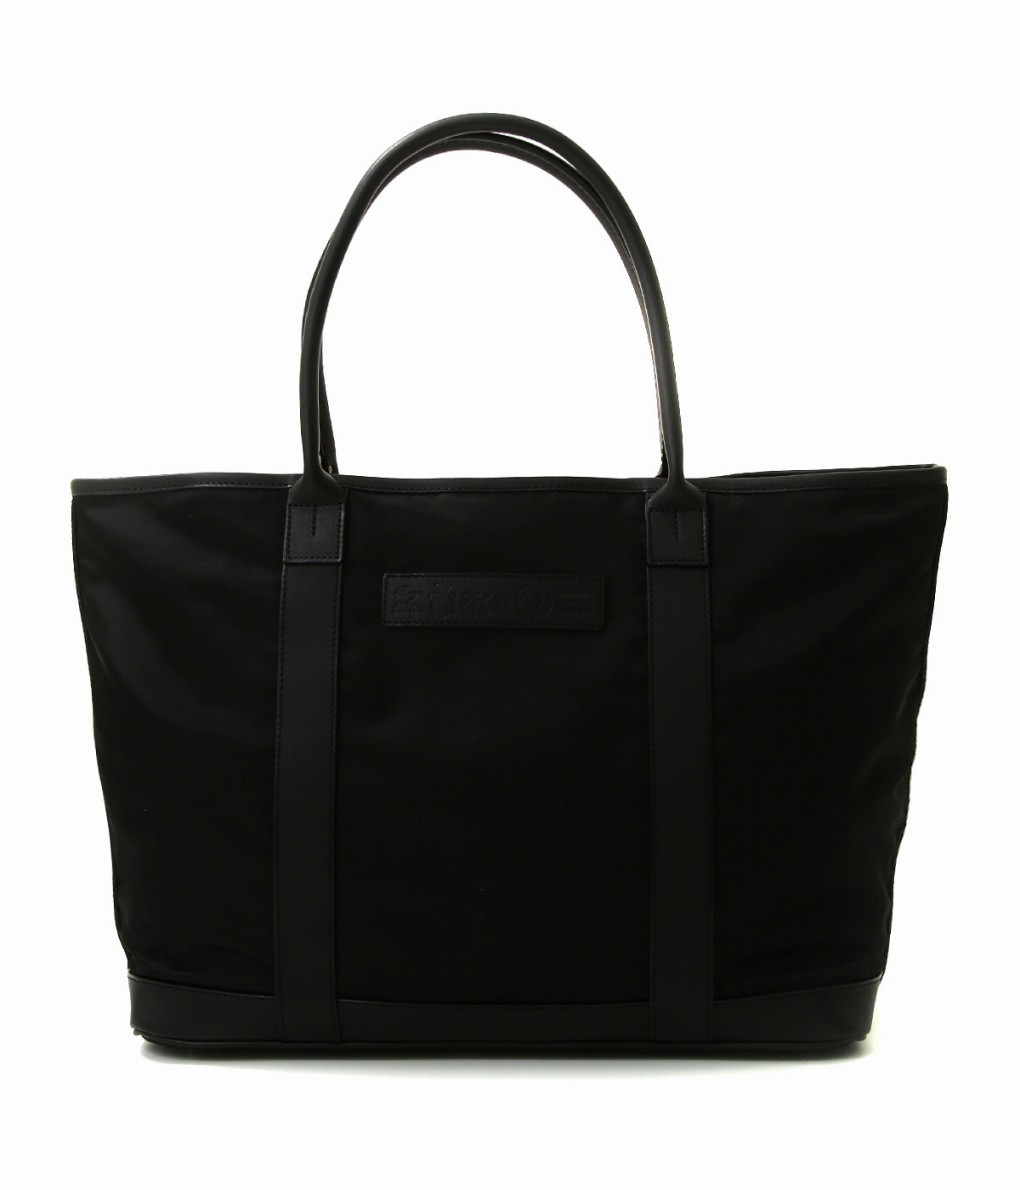 Felisi / フェリージ : Tote Bag : トートバッグ レザー ナイロン 本革 : 19-24-DS-041 【MUS】